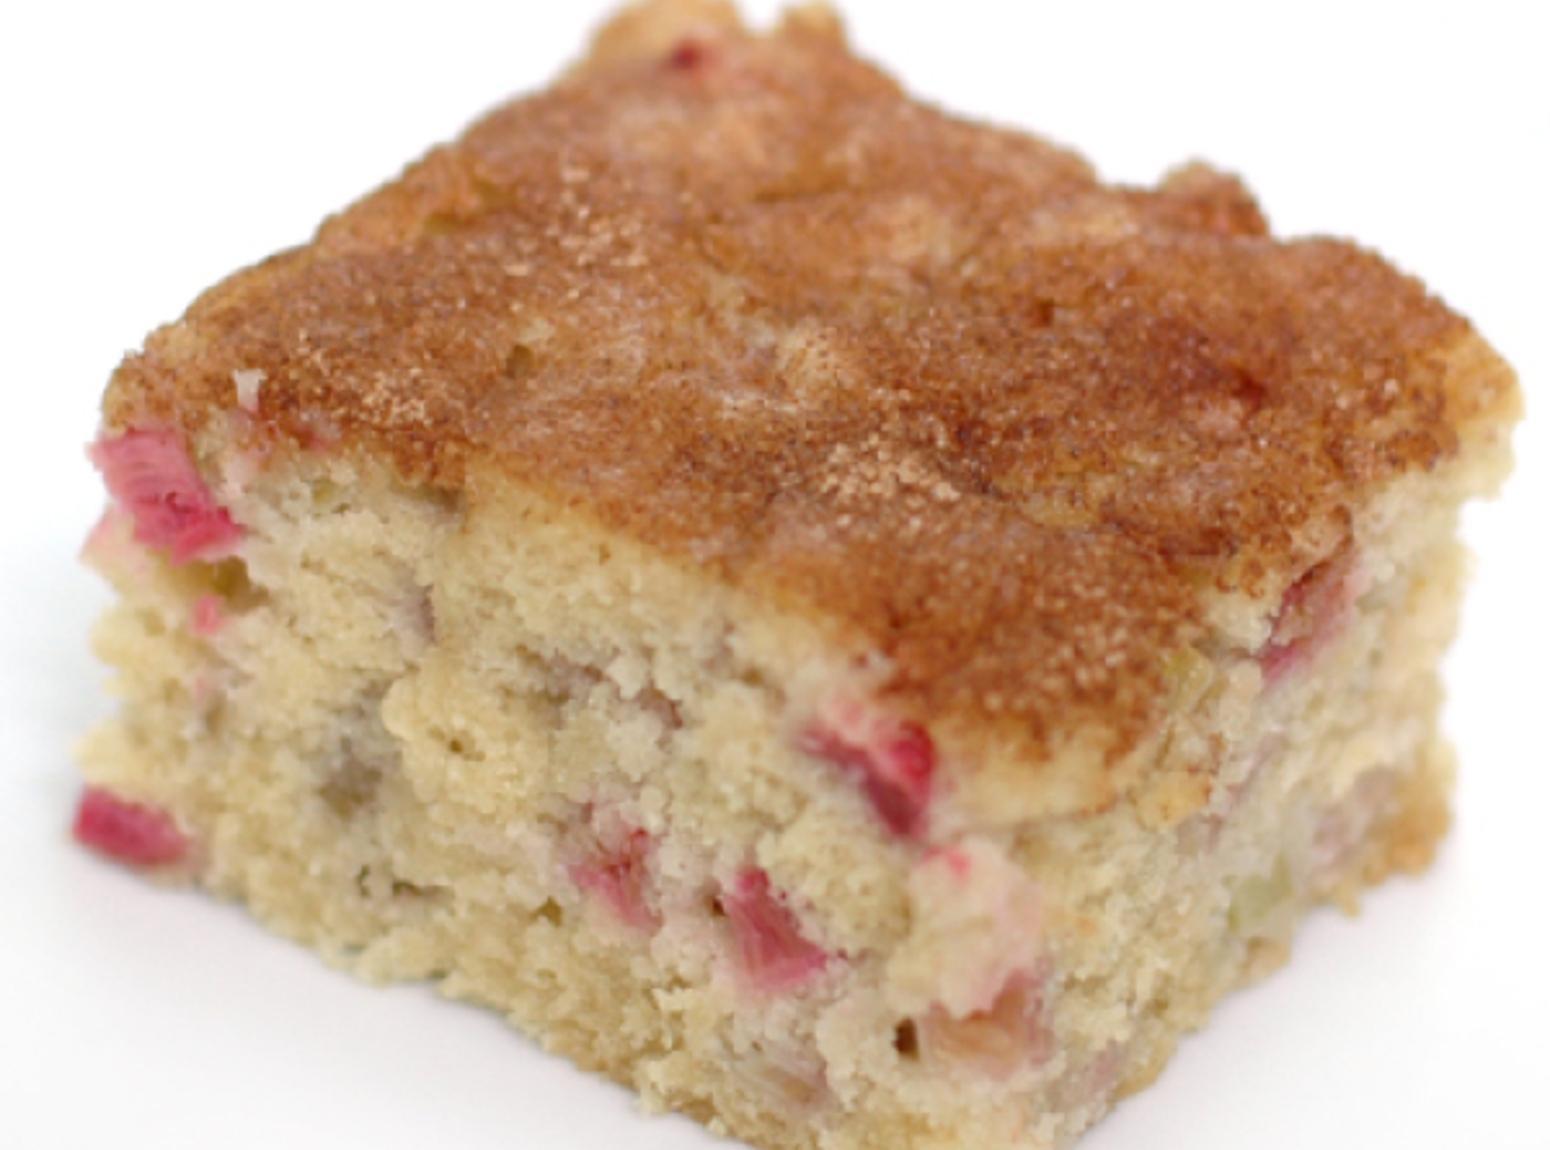 Rhubarb Dessert Recipes  Rhubarb Cake Recipe 6